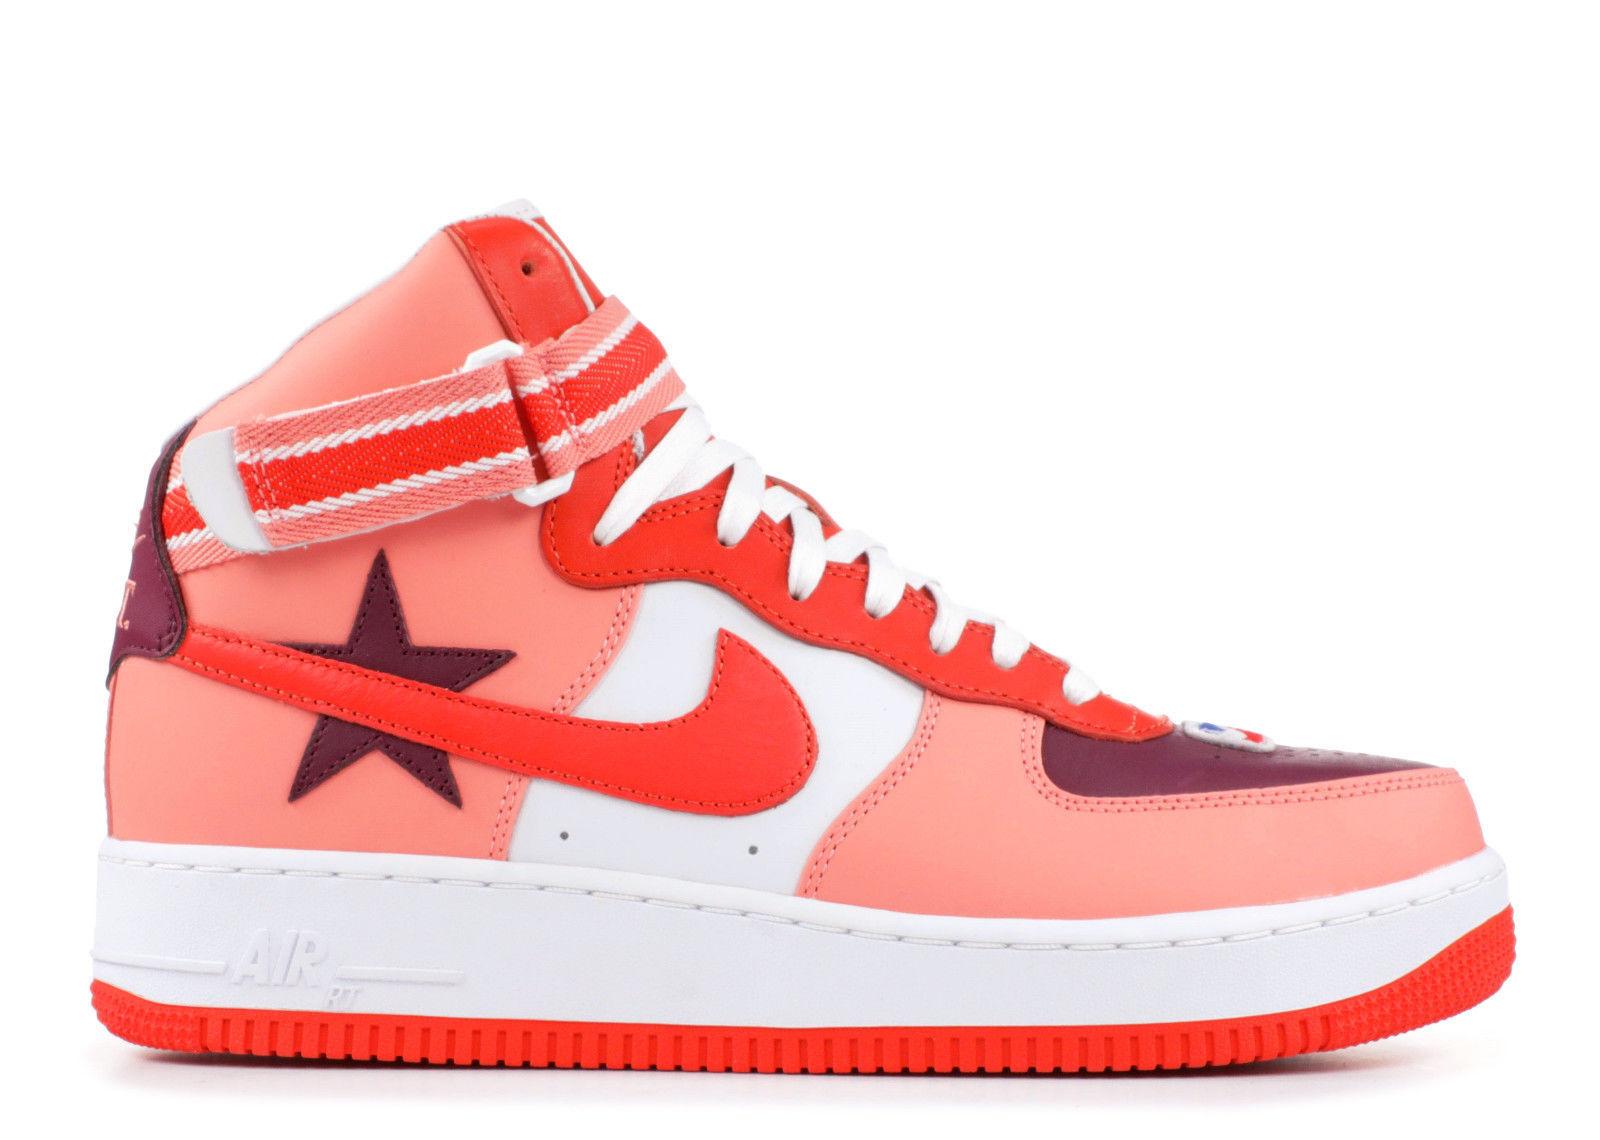 Nike Air Force 1 High x RT RT RT Riccardo Tisci Minotaurs AQ3366-601 LIMITED 0e0b94